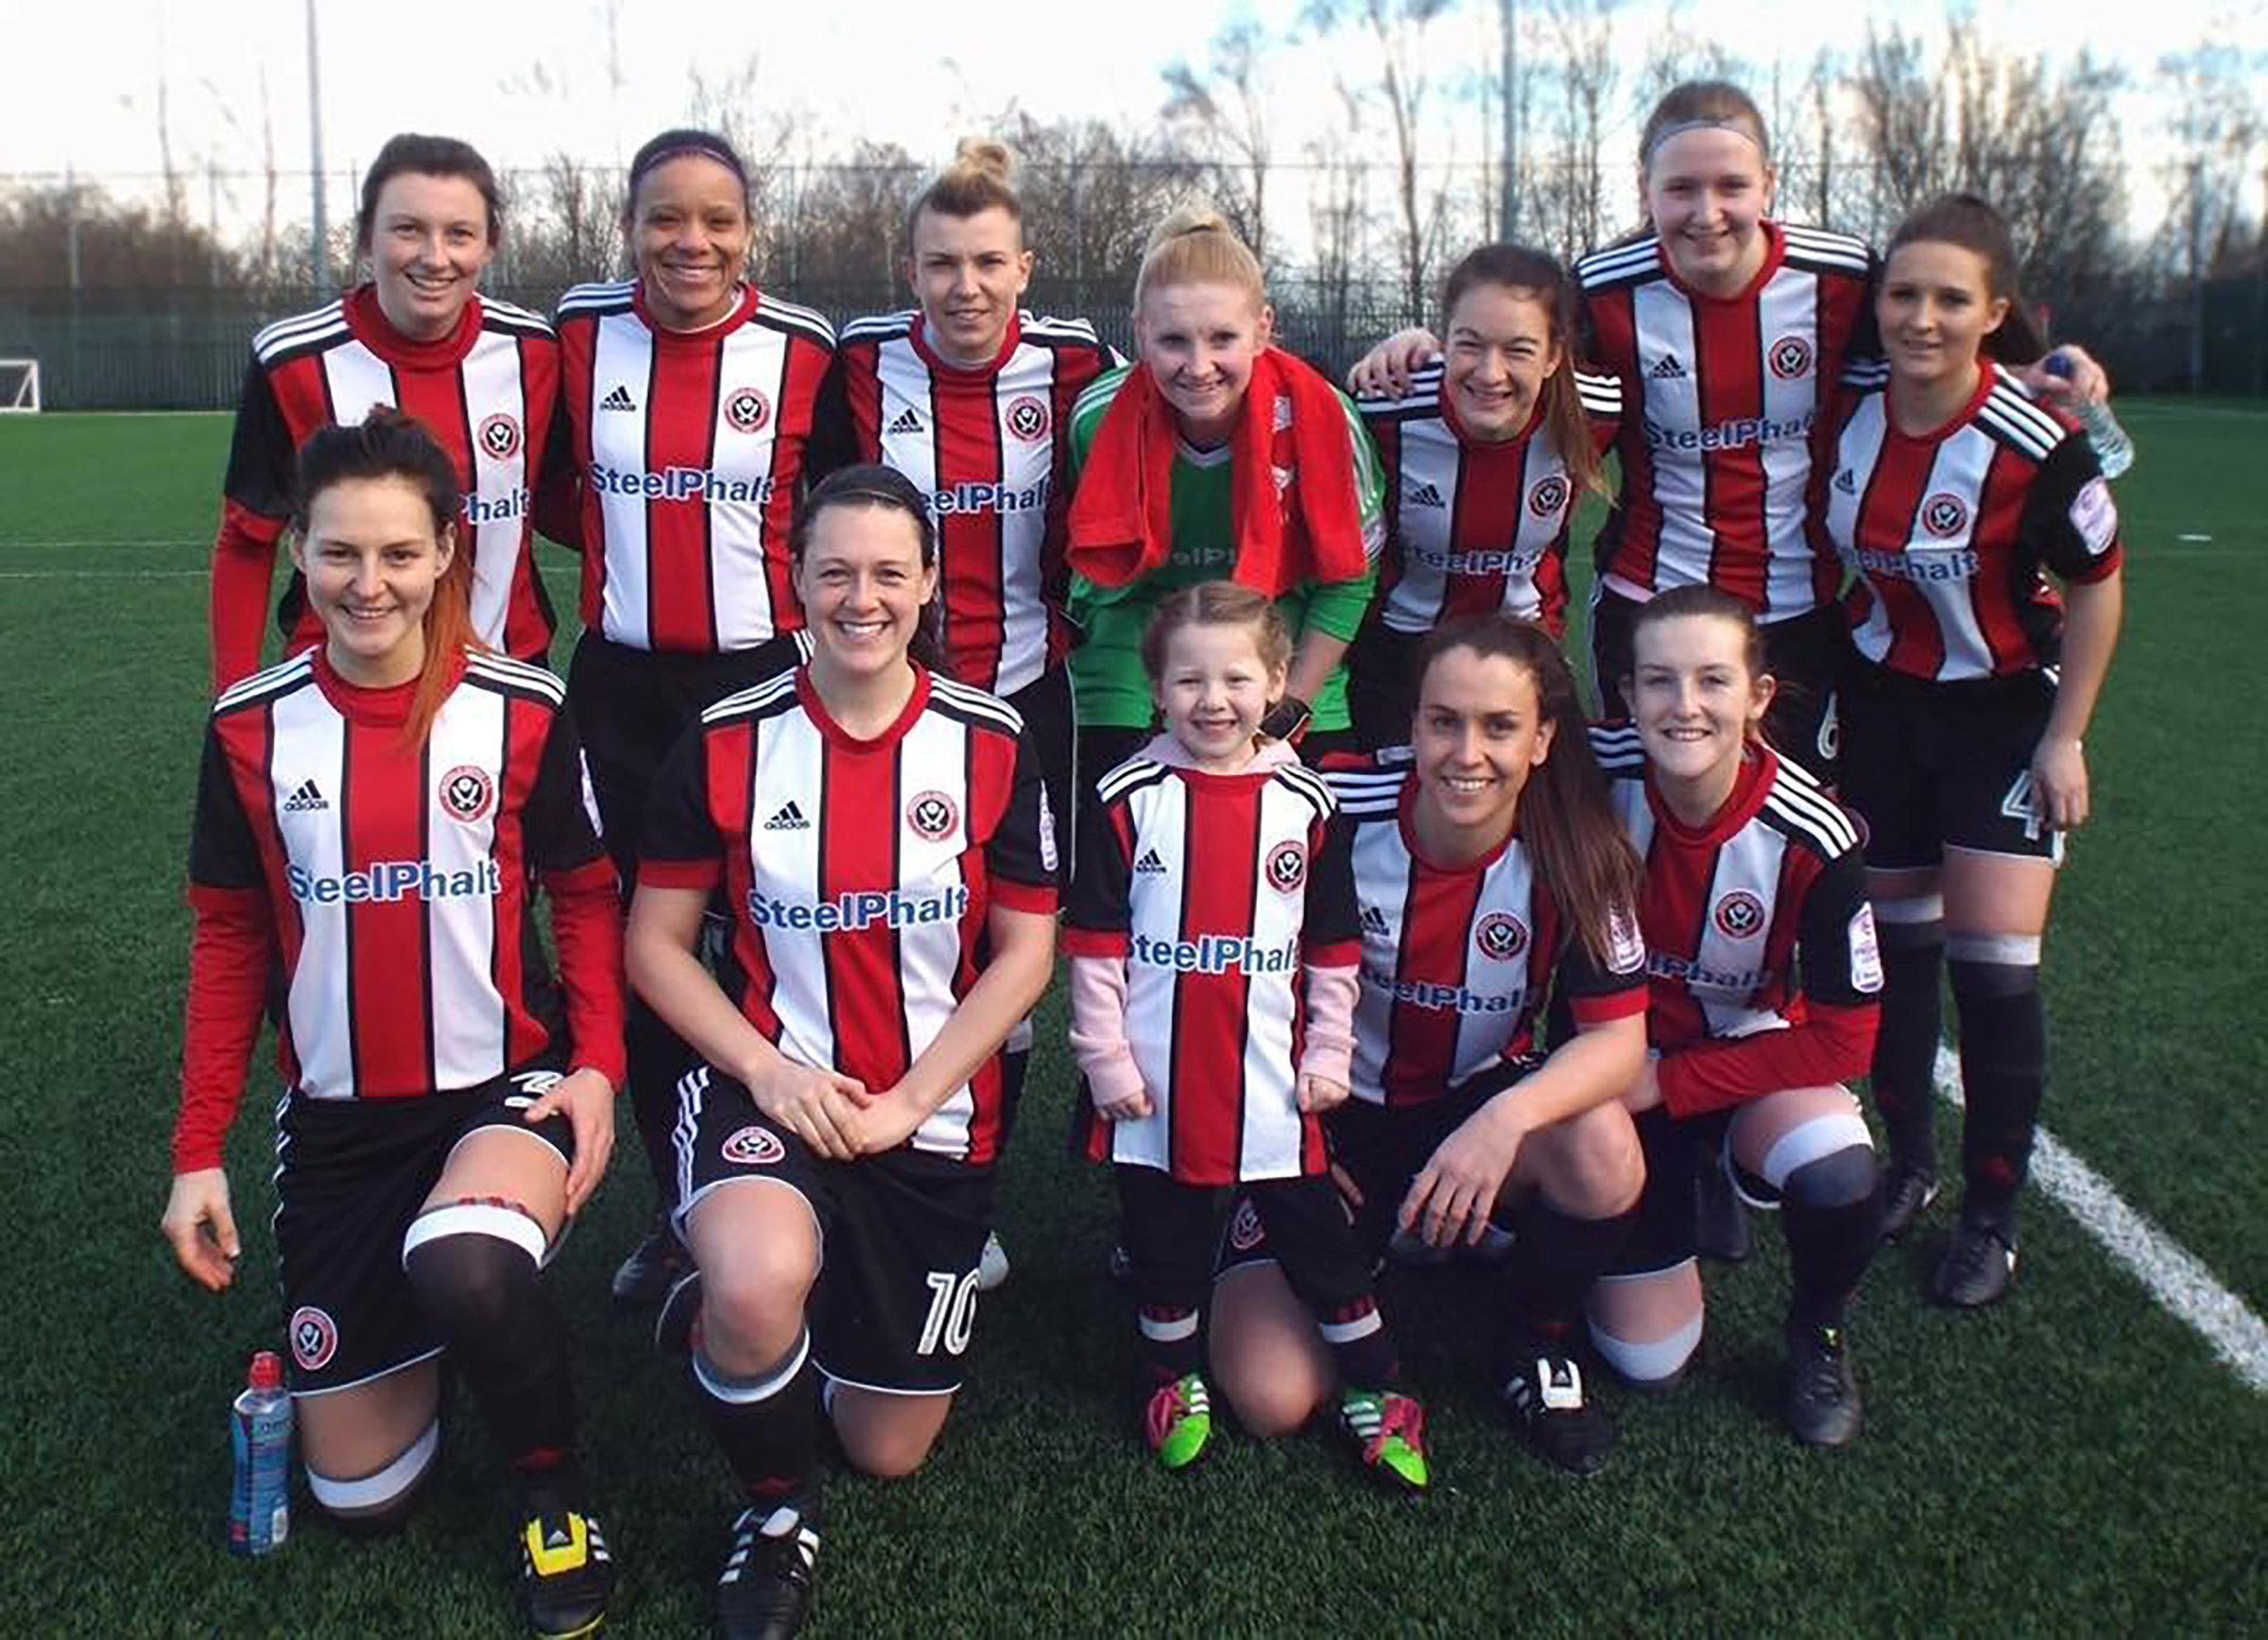 Jessie Adams with SUFC Ladies team.